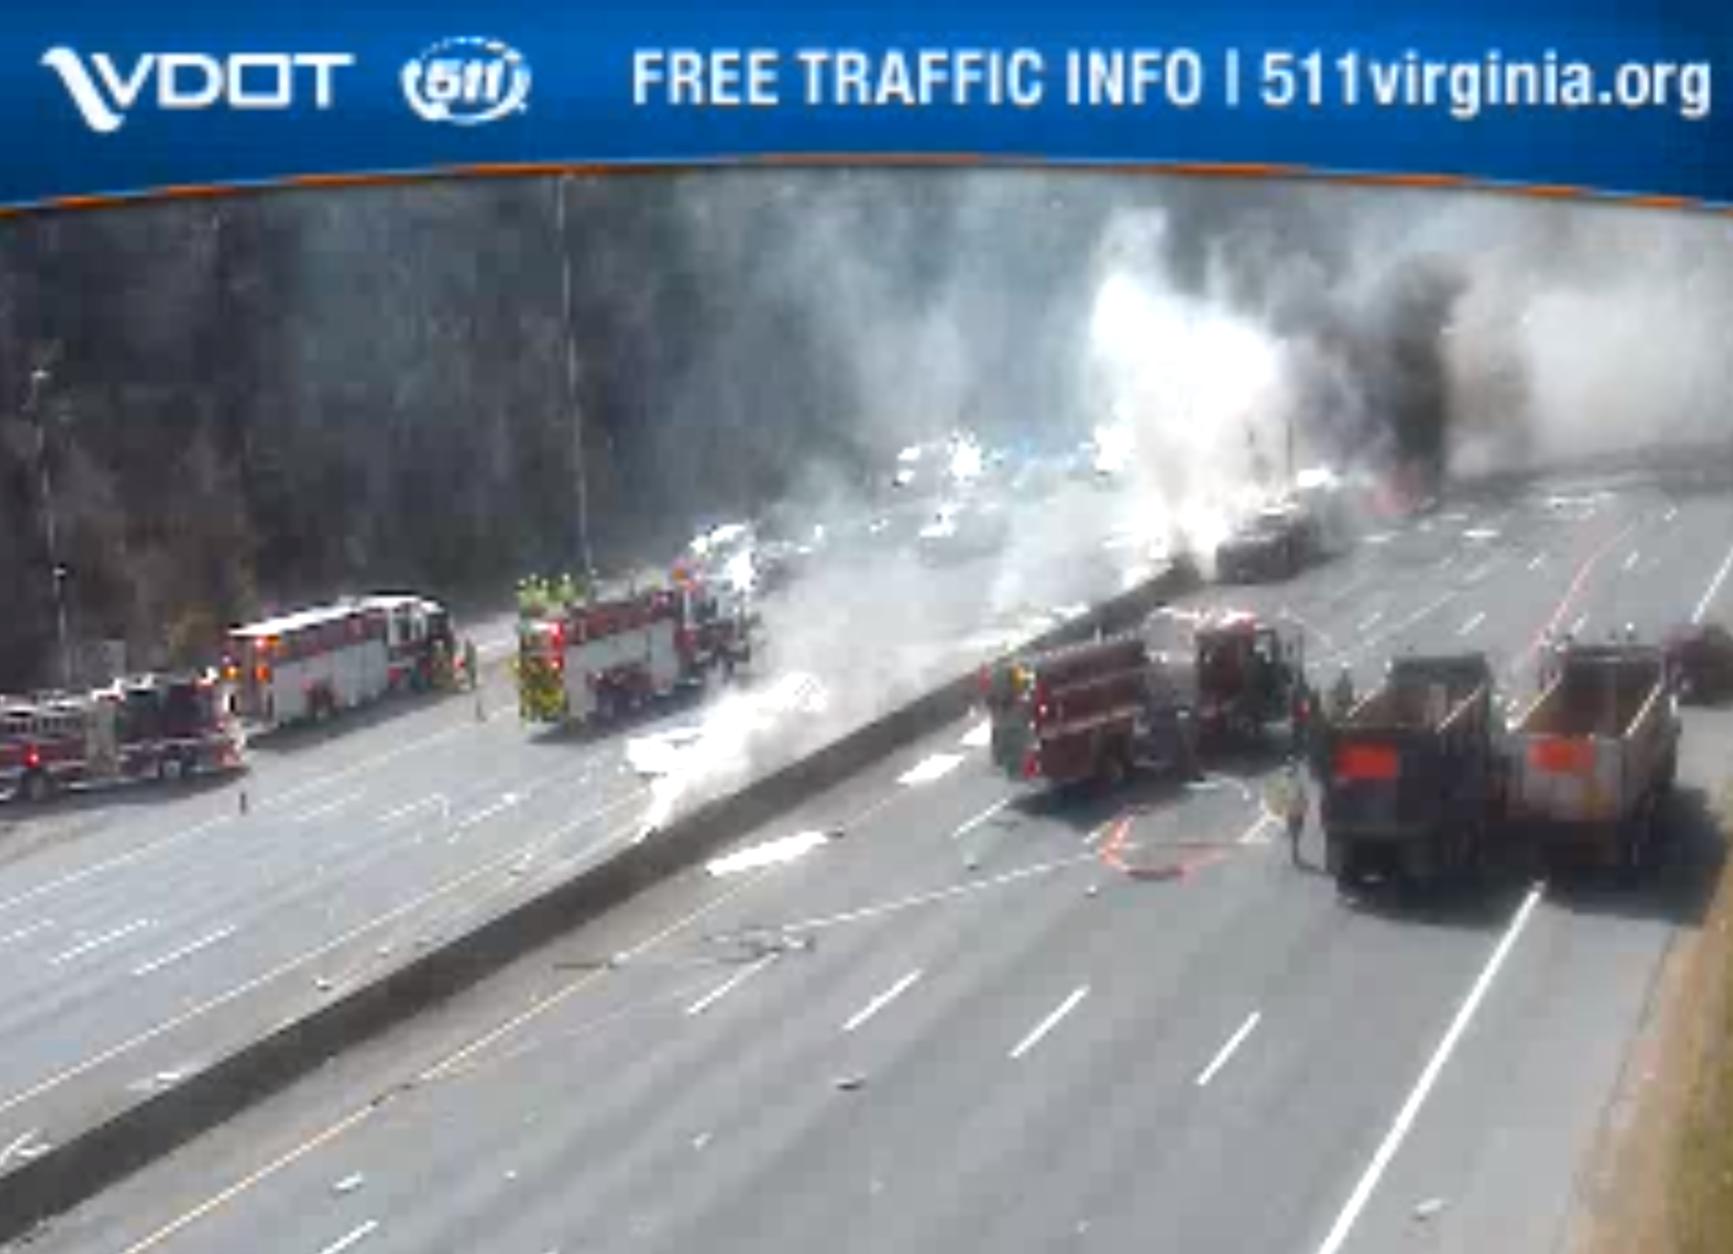 The fire is on the Beltway near Van Dorn Street. (Courtesy VDOT)